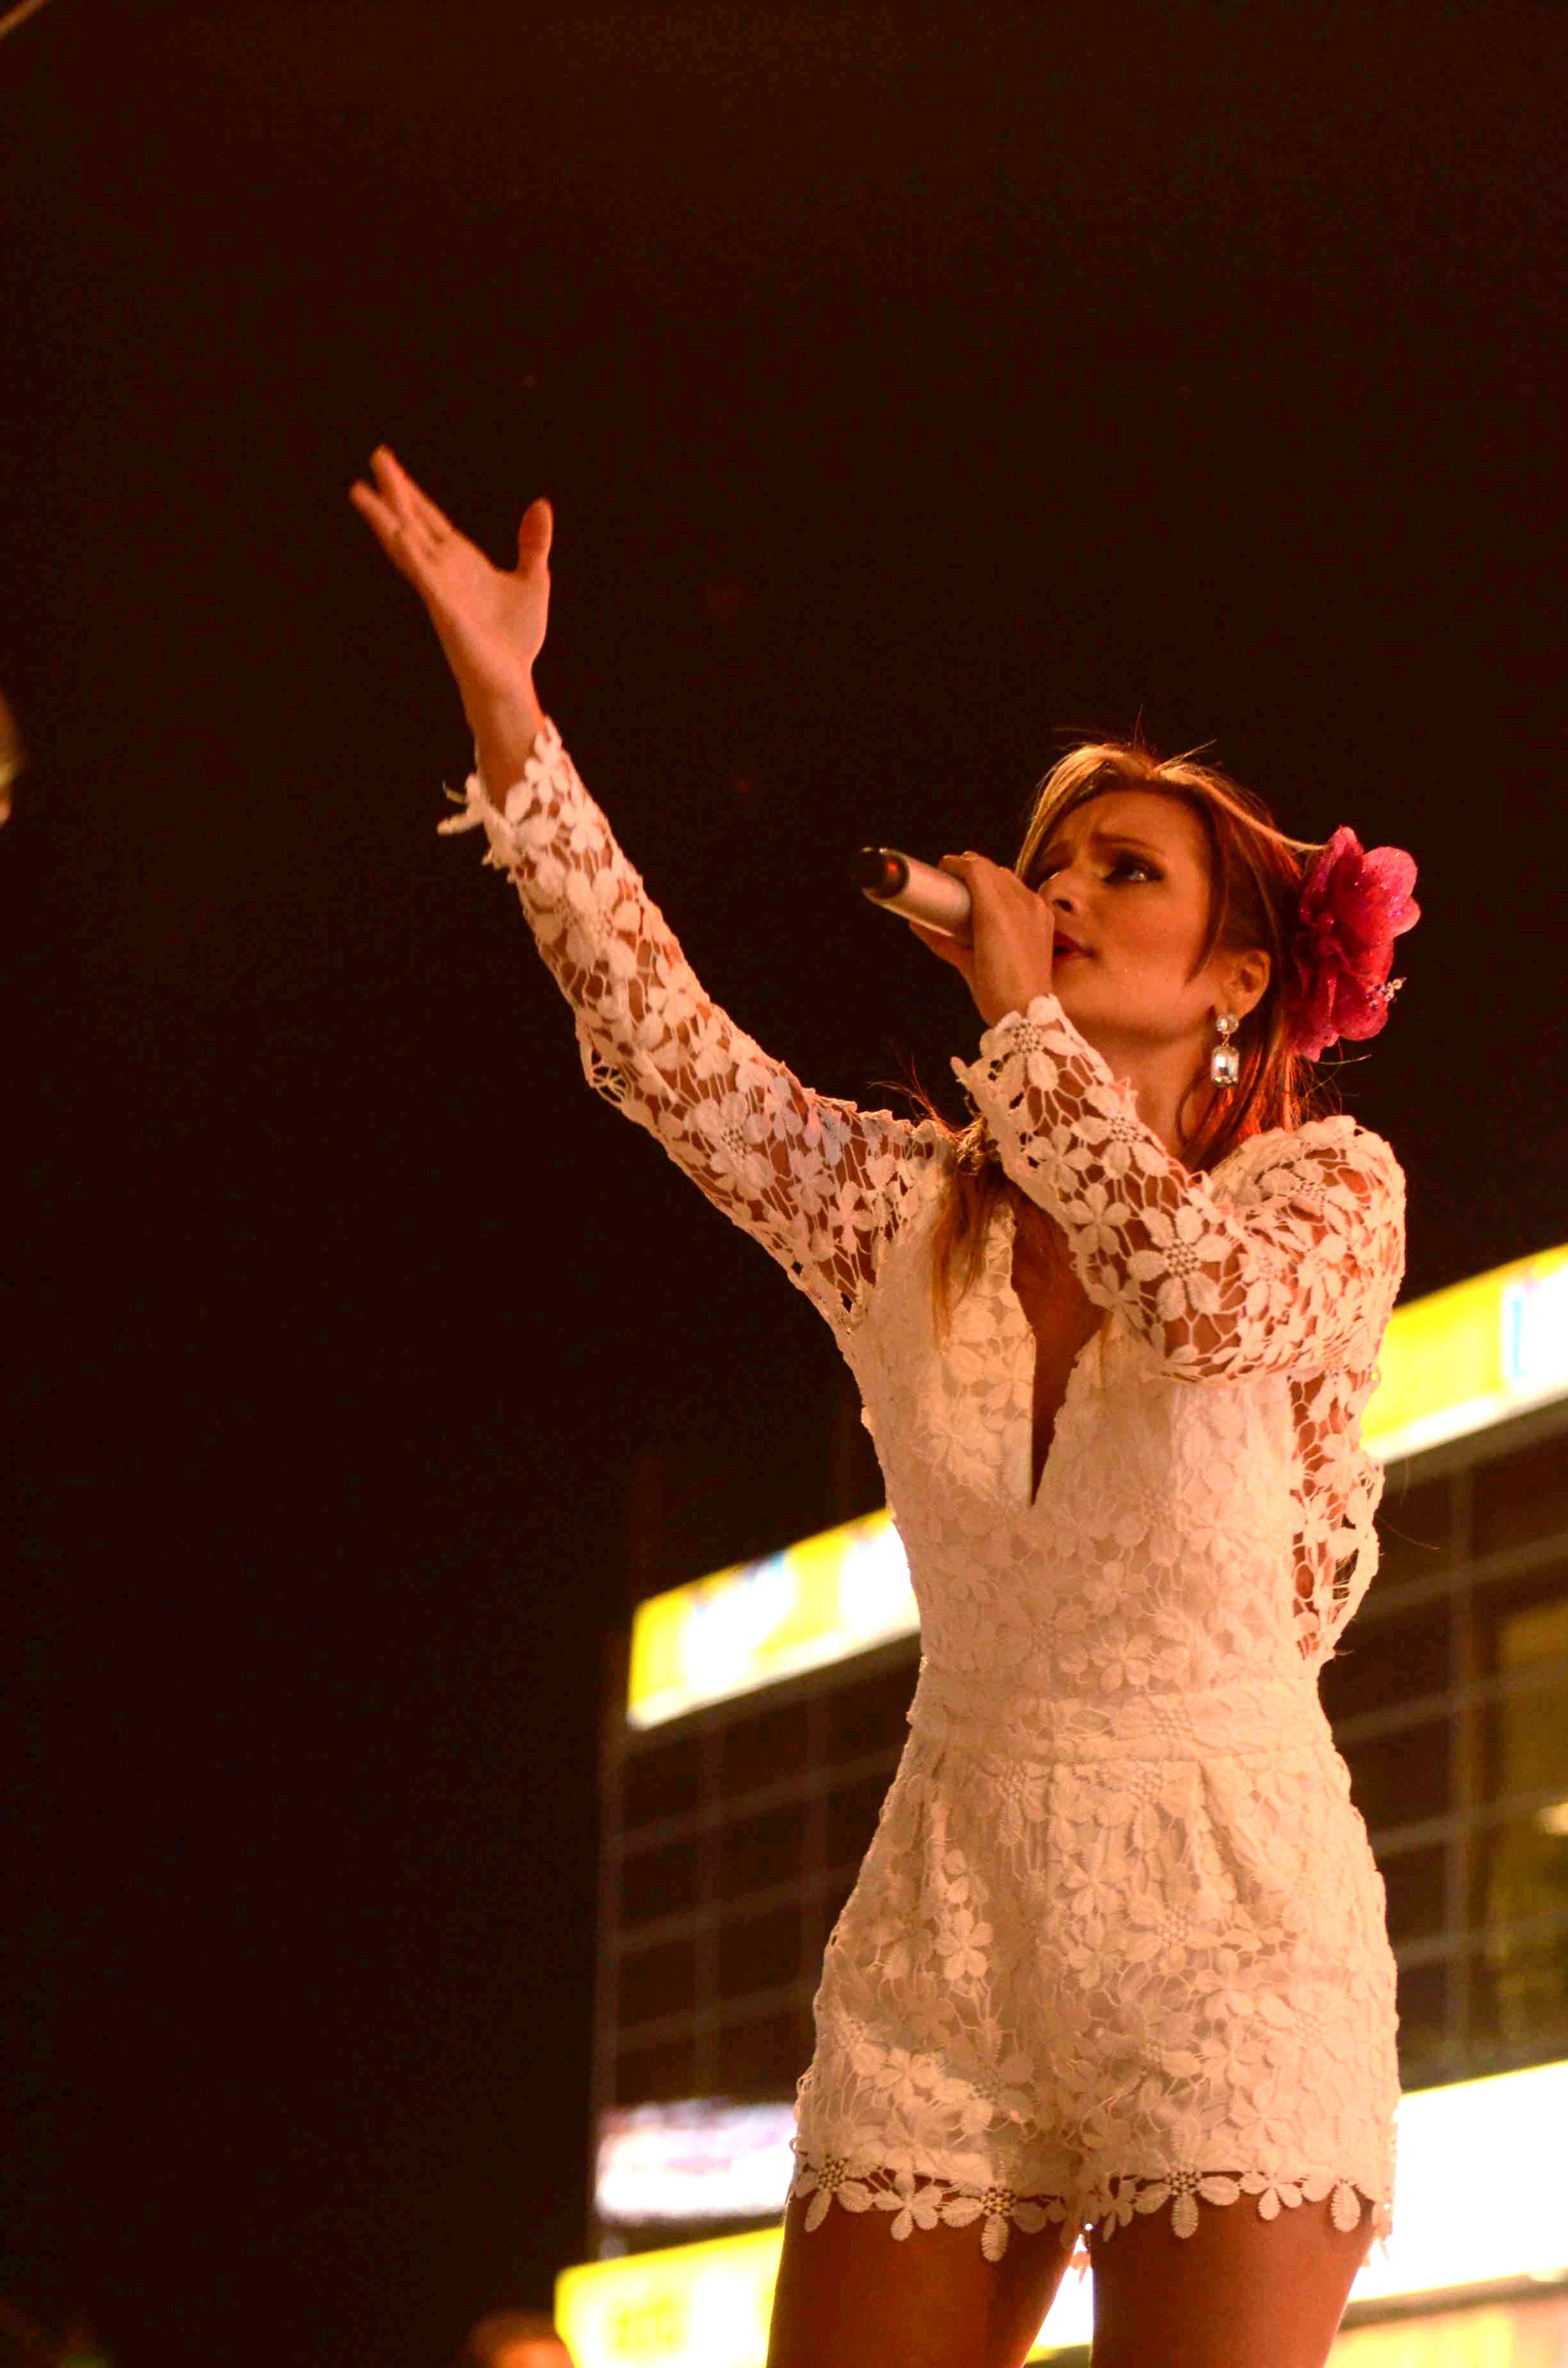 Margarita Rosa Doria Carrascal, Reina de la Canción Vallenata Inédita 2015. Foto Adamis Guerra